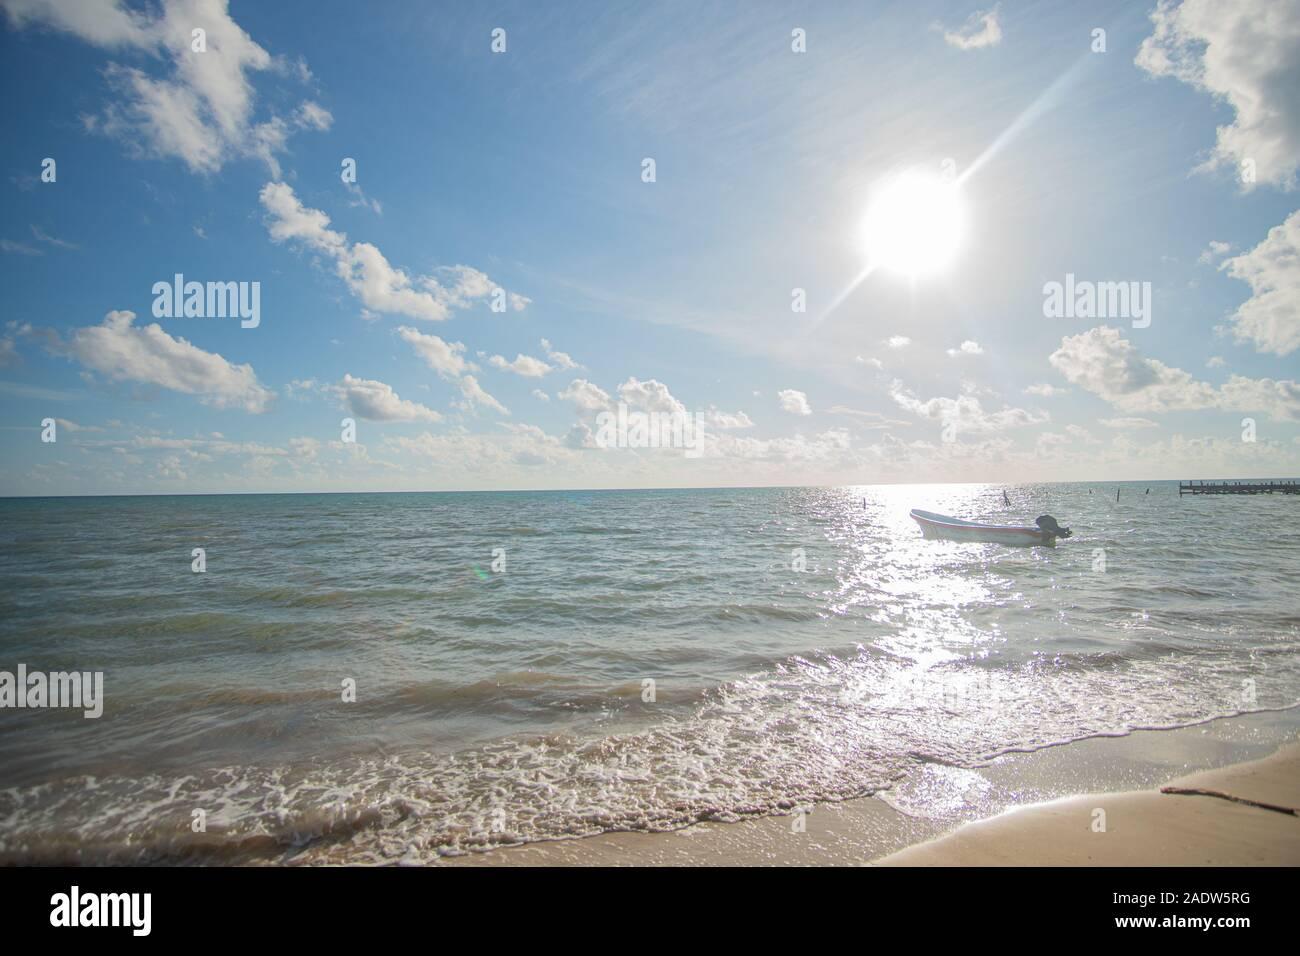 Celeste Beach in Punta Allen al Mar dei Caraibi Foto Stock